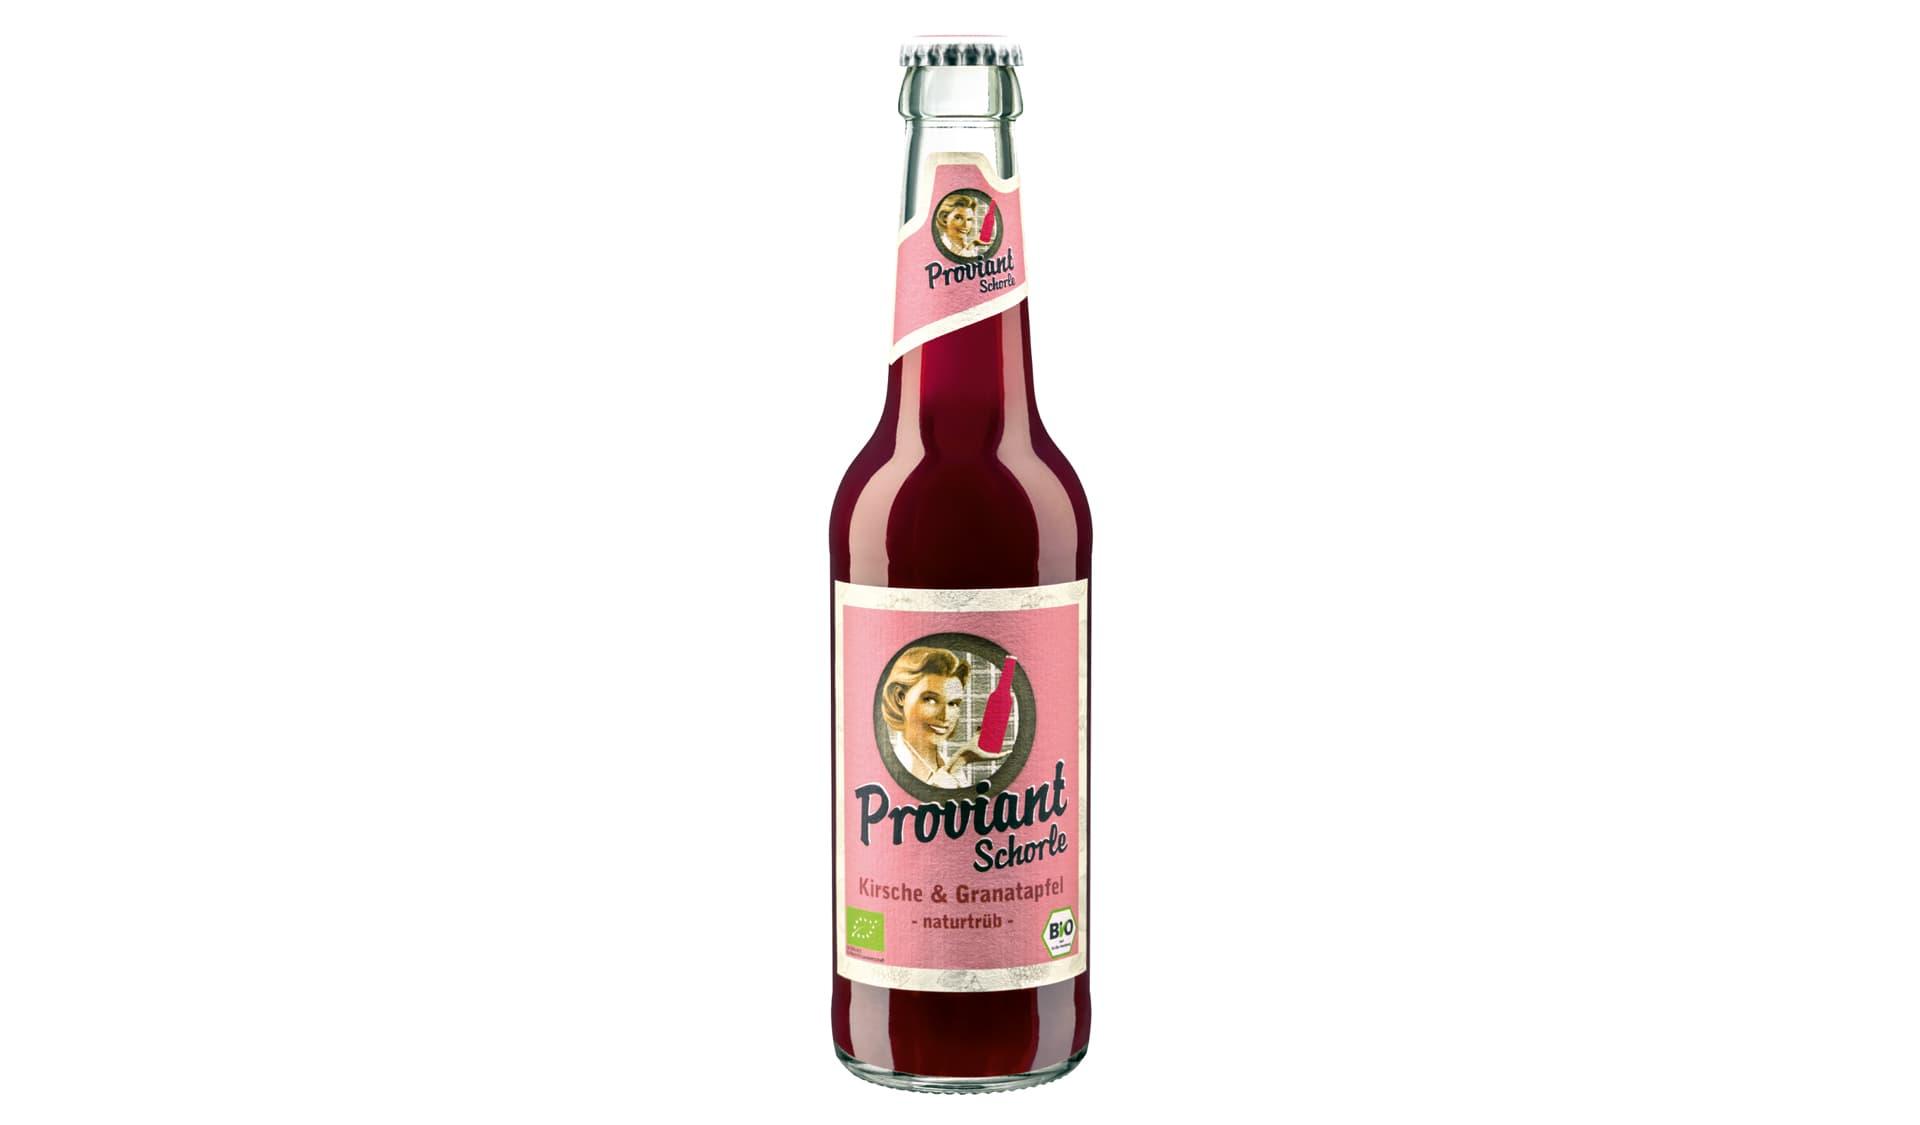 Proviant Schorle Kirsche & Granatapfel (www.proviant-limo.de)